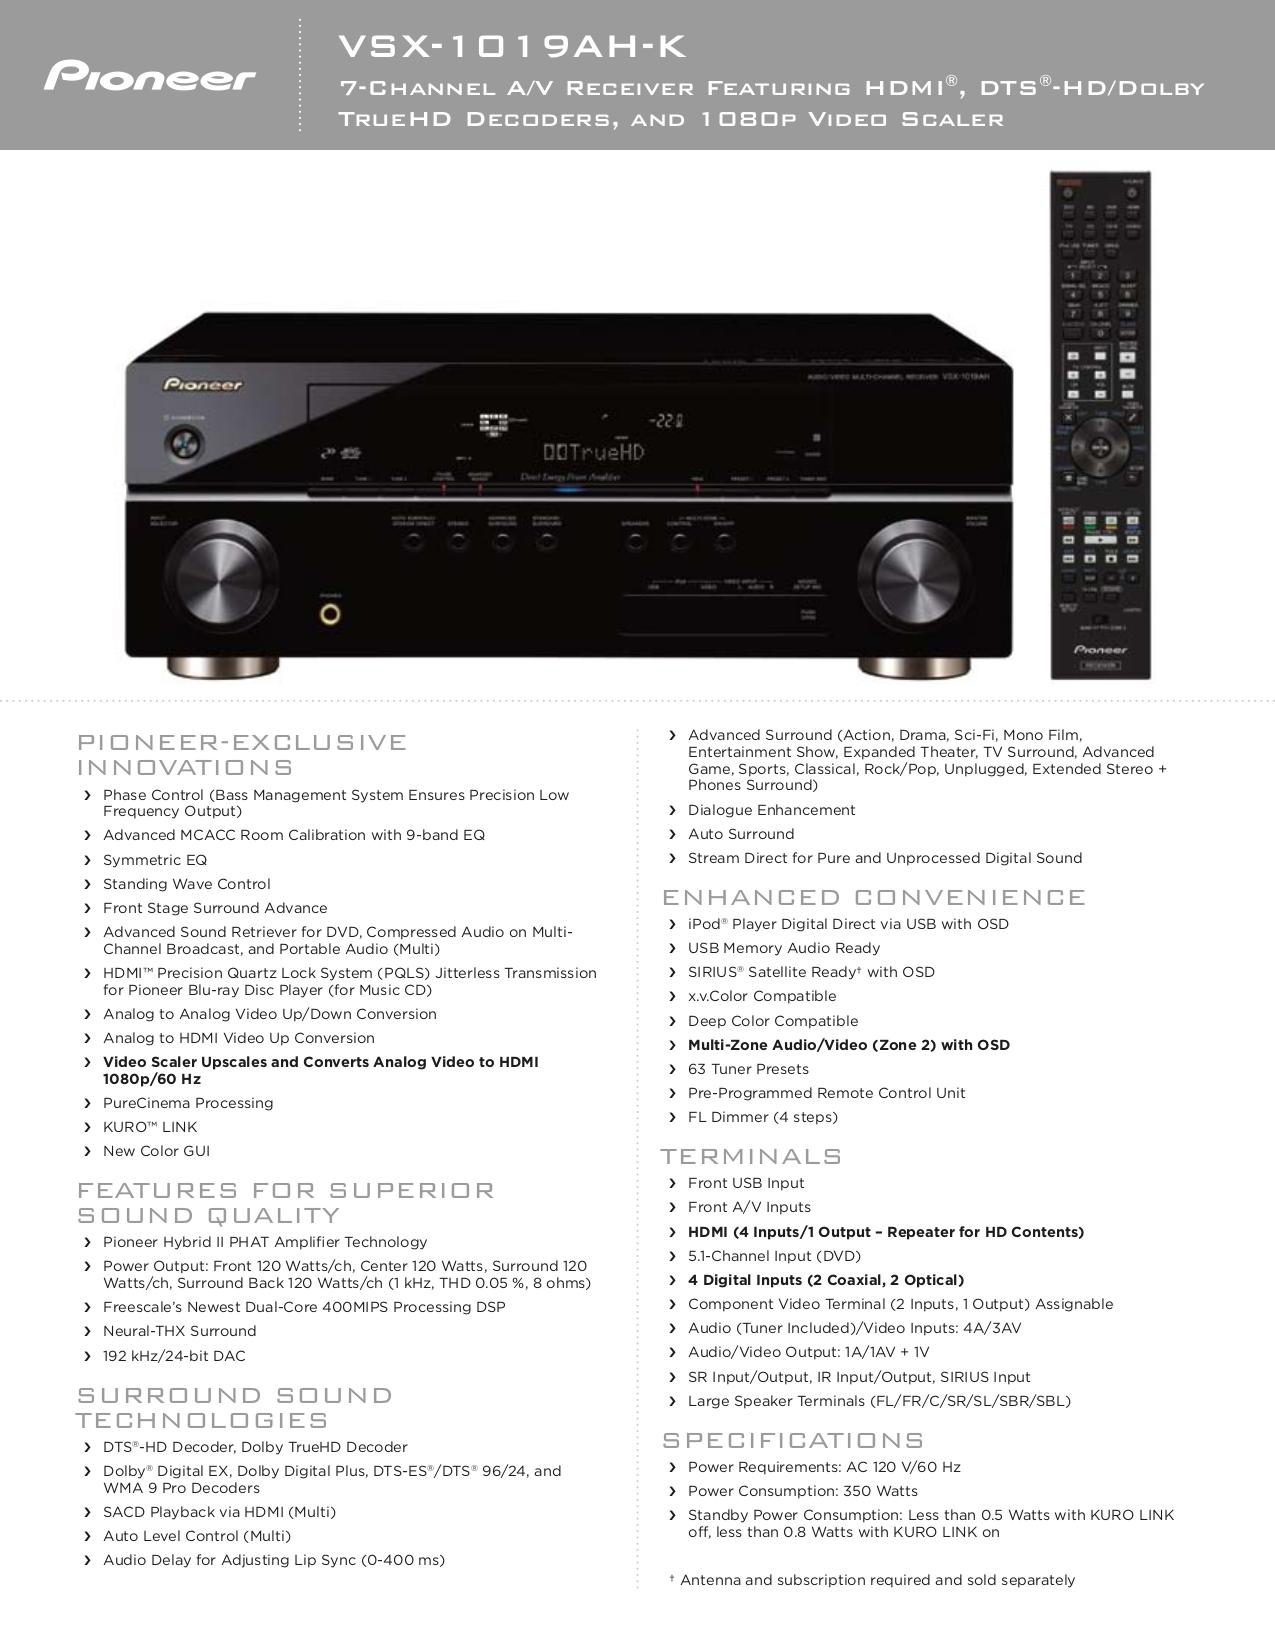 download free pdf for pioneer vsx 1019ah receiver manual rh umlib com Pioneer VSX 1019Ah K Walmart Pioneer VSX 1019Ah K Walmart